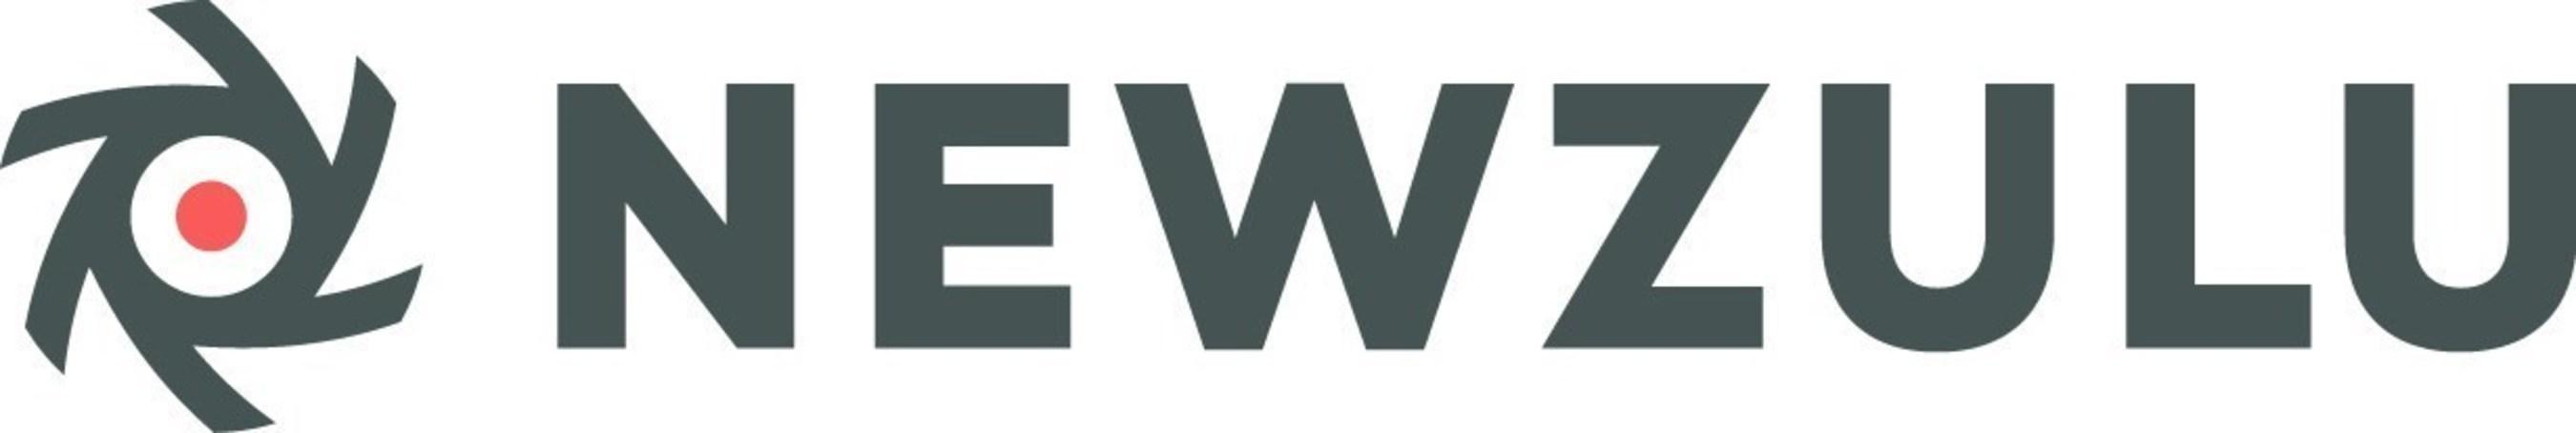 Newzulu Signs Partnership With Agencia EFE